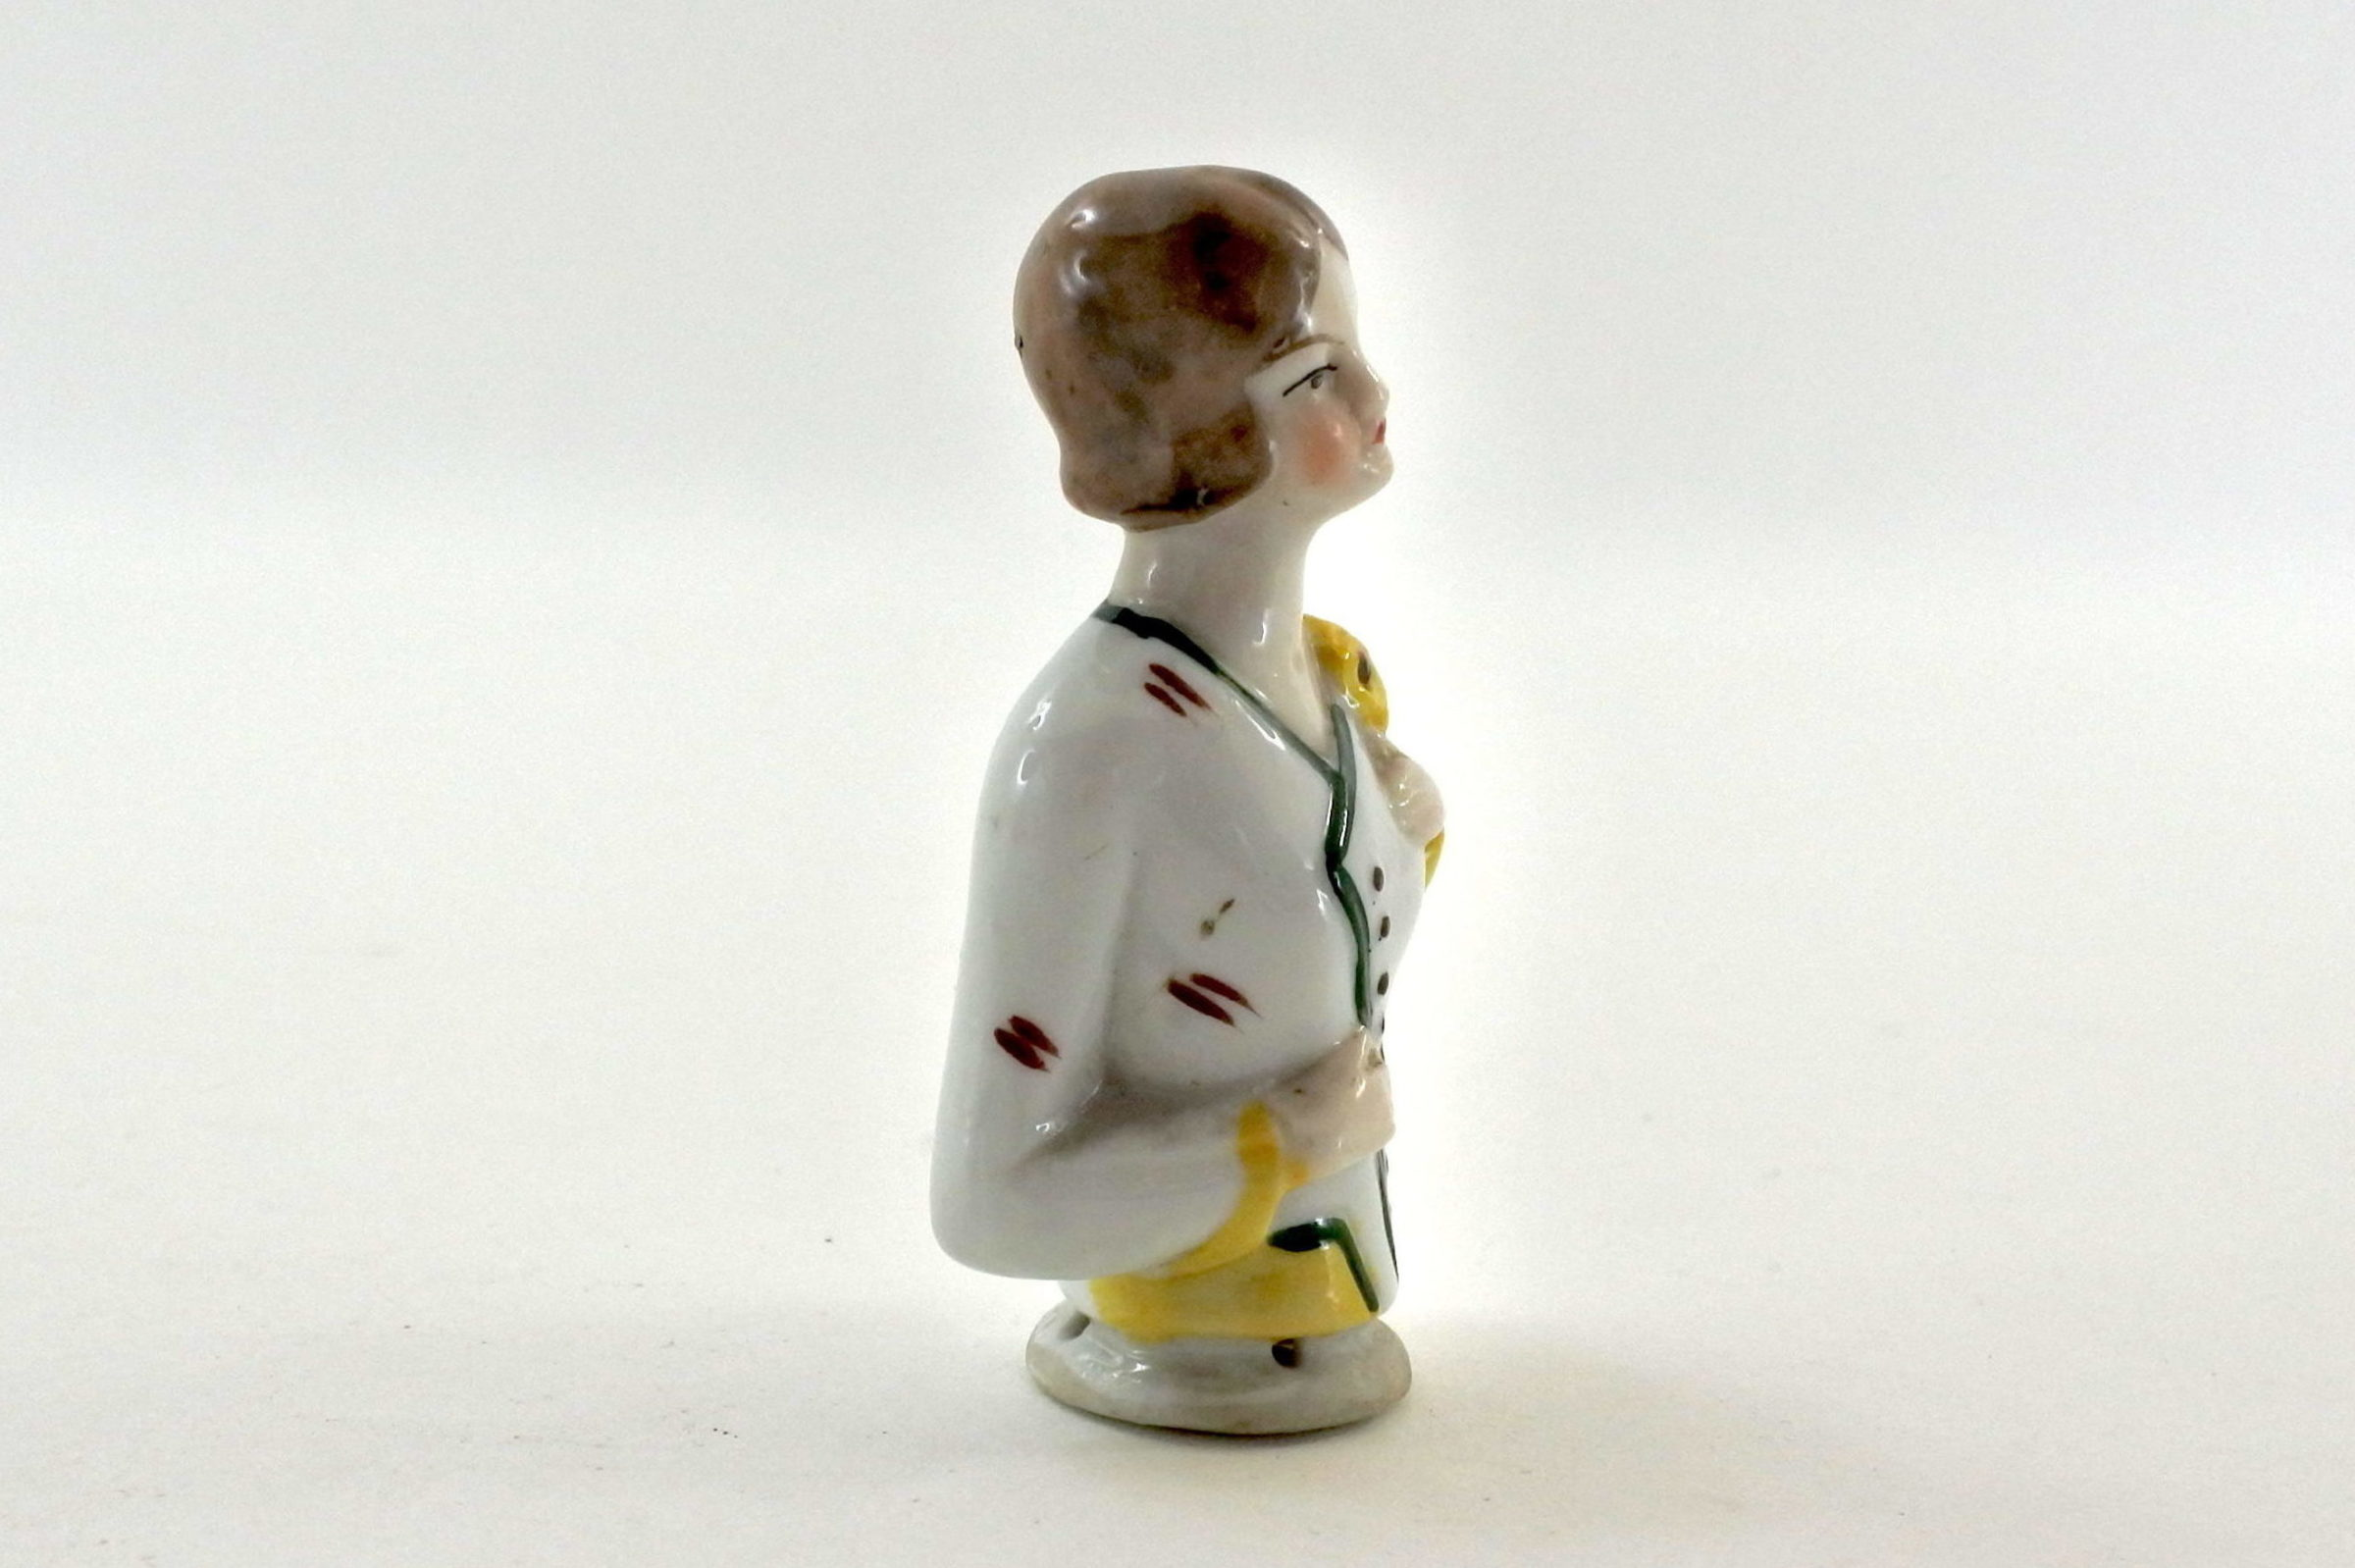 Statuina in ceramica rappresentante una signorina - demi poupée - 3